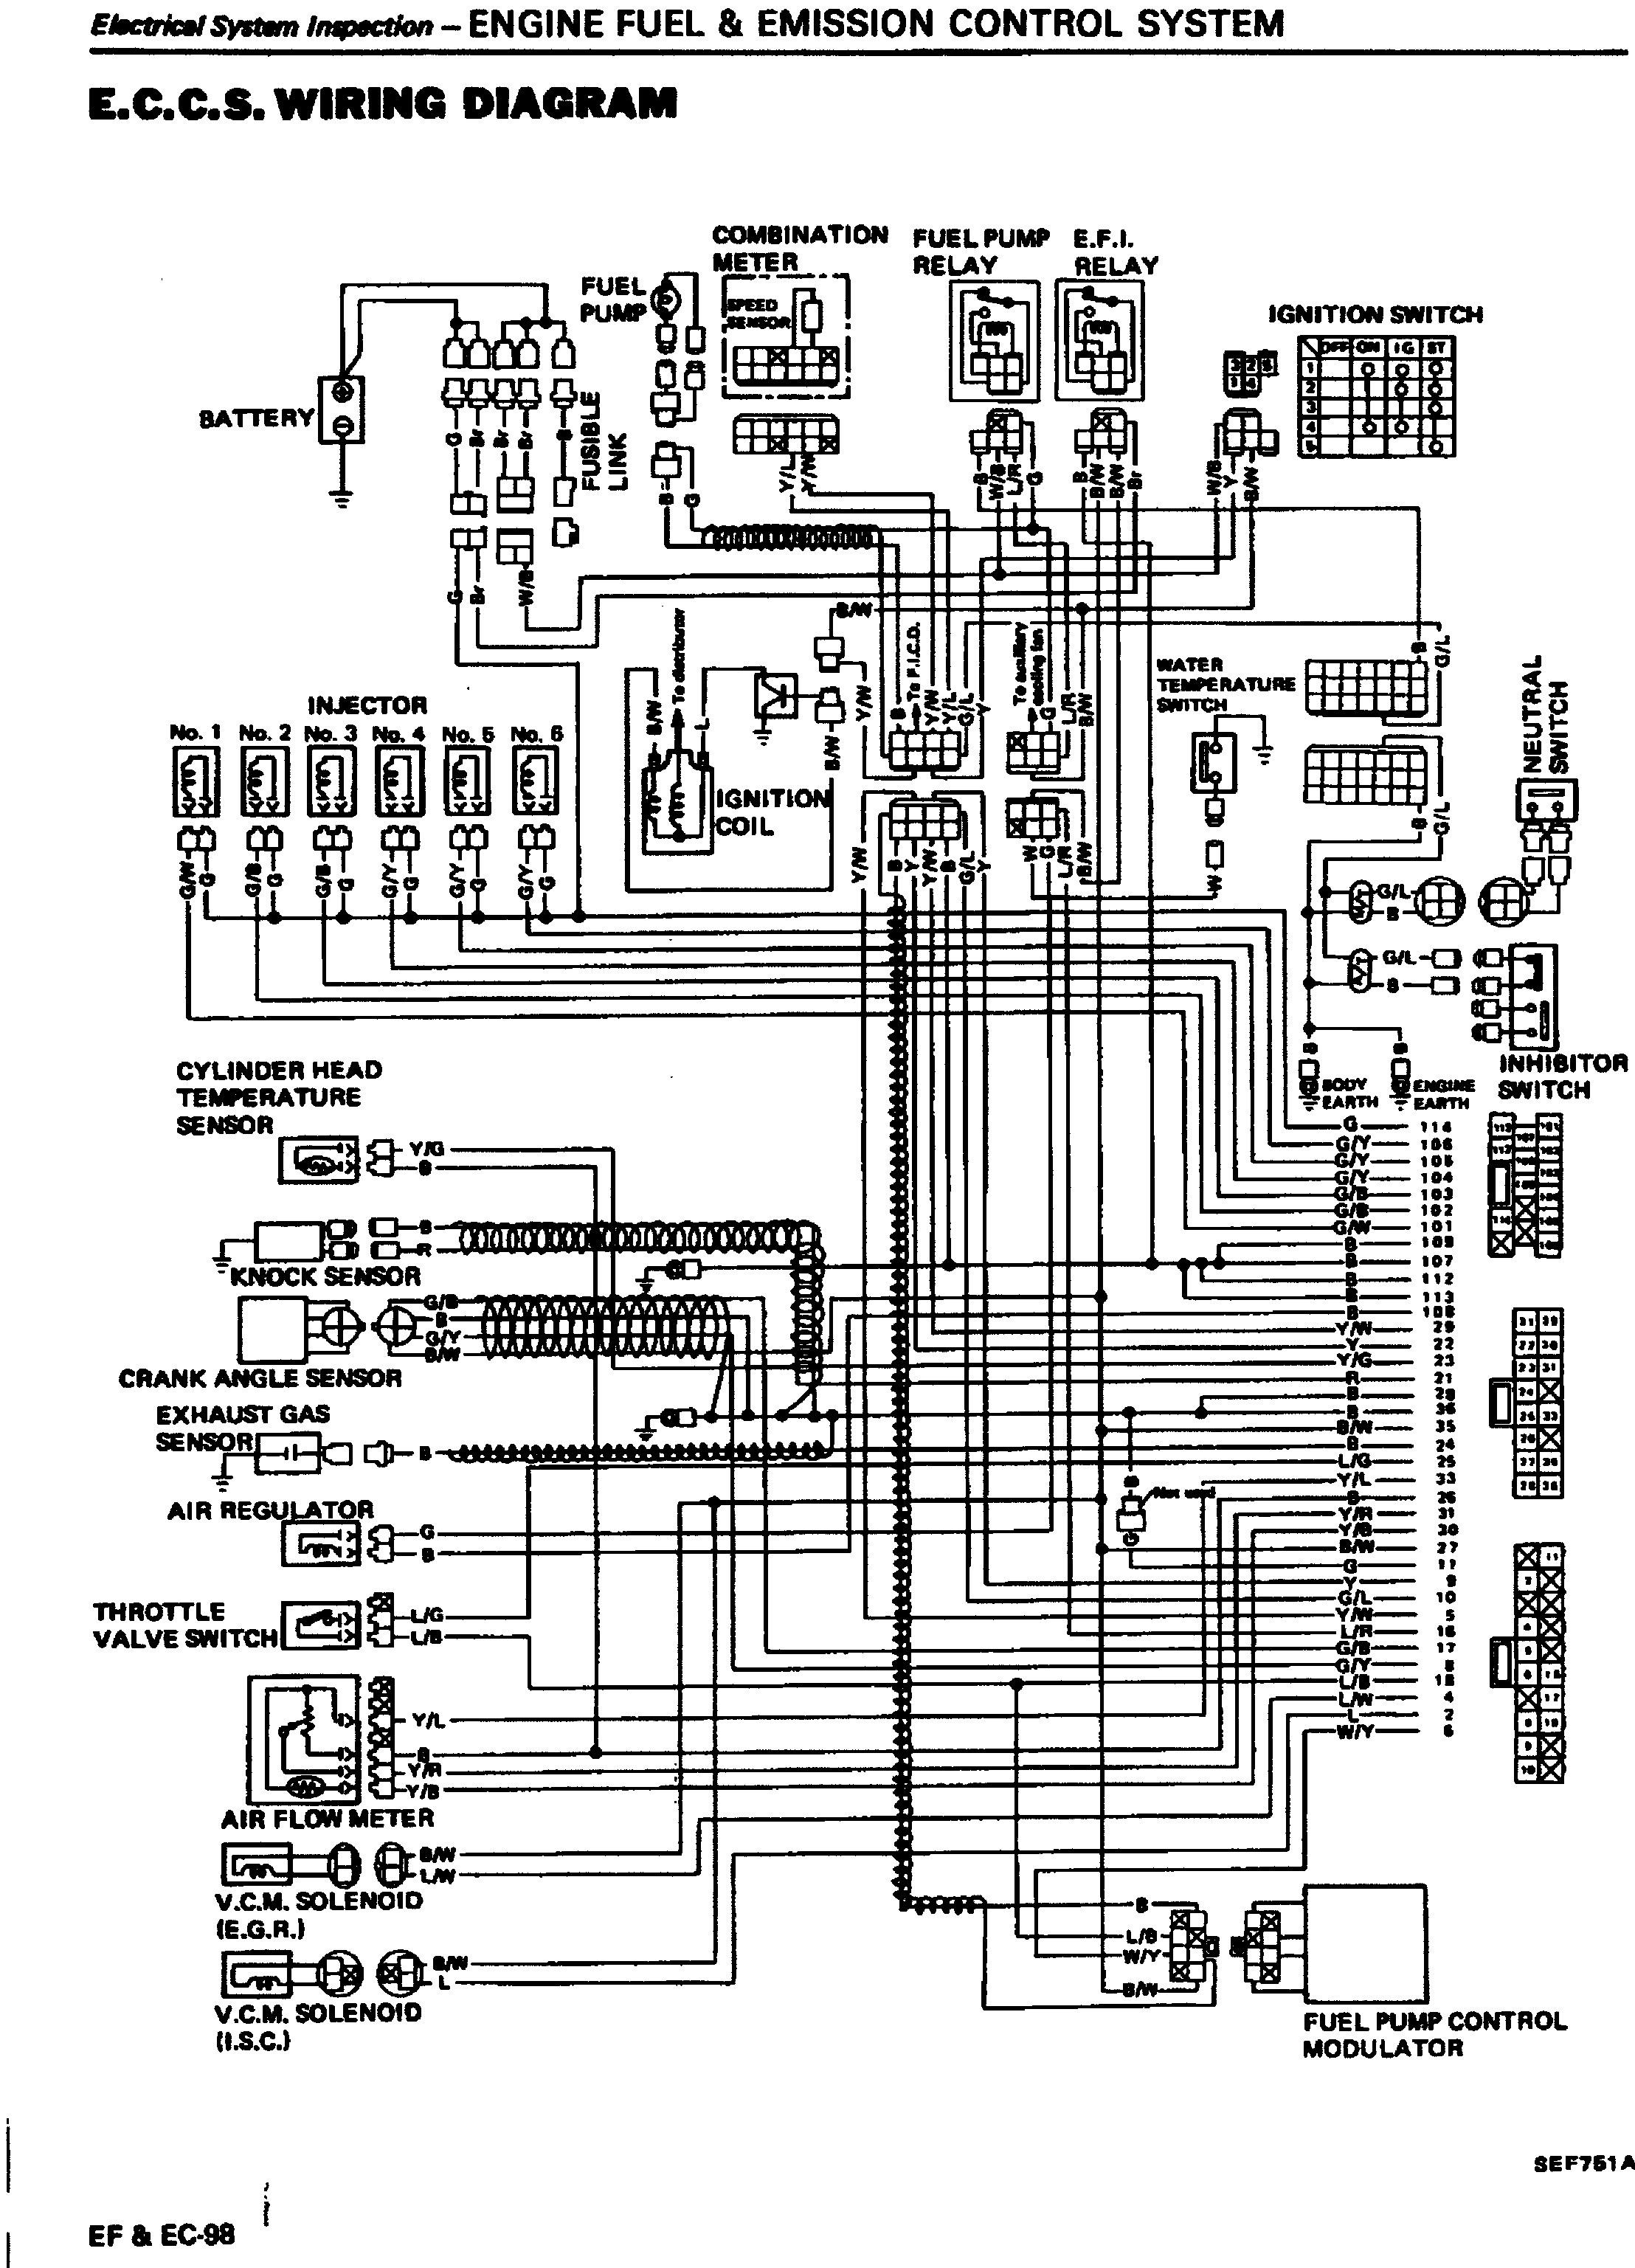 Datsun/Nissan 280zx Turbo Engine Swap